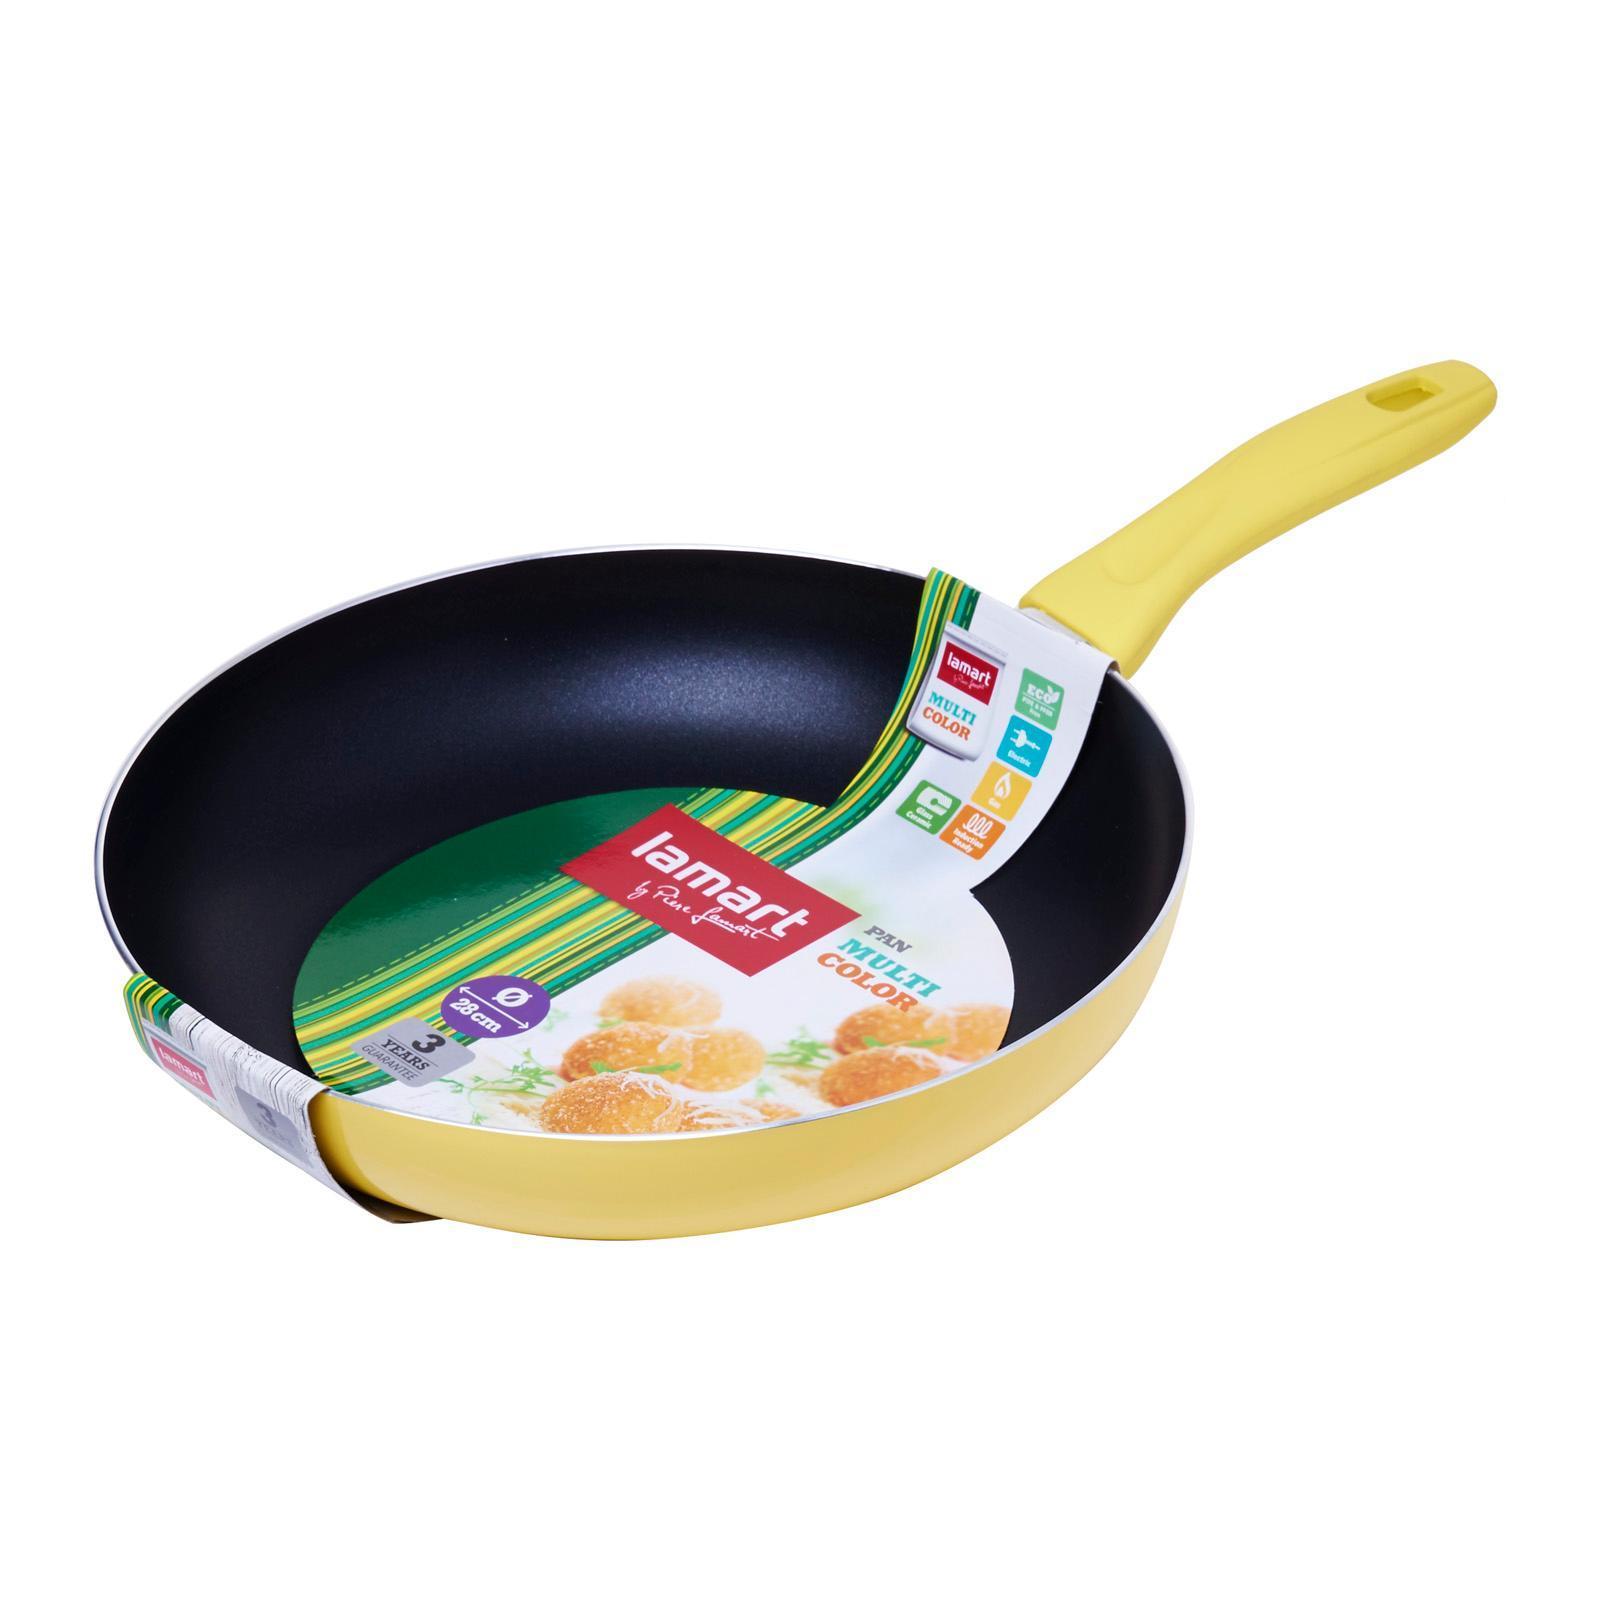 Lamart Induction Ready Non-Stick Fry Pan 28X5Cm - Yellow